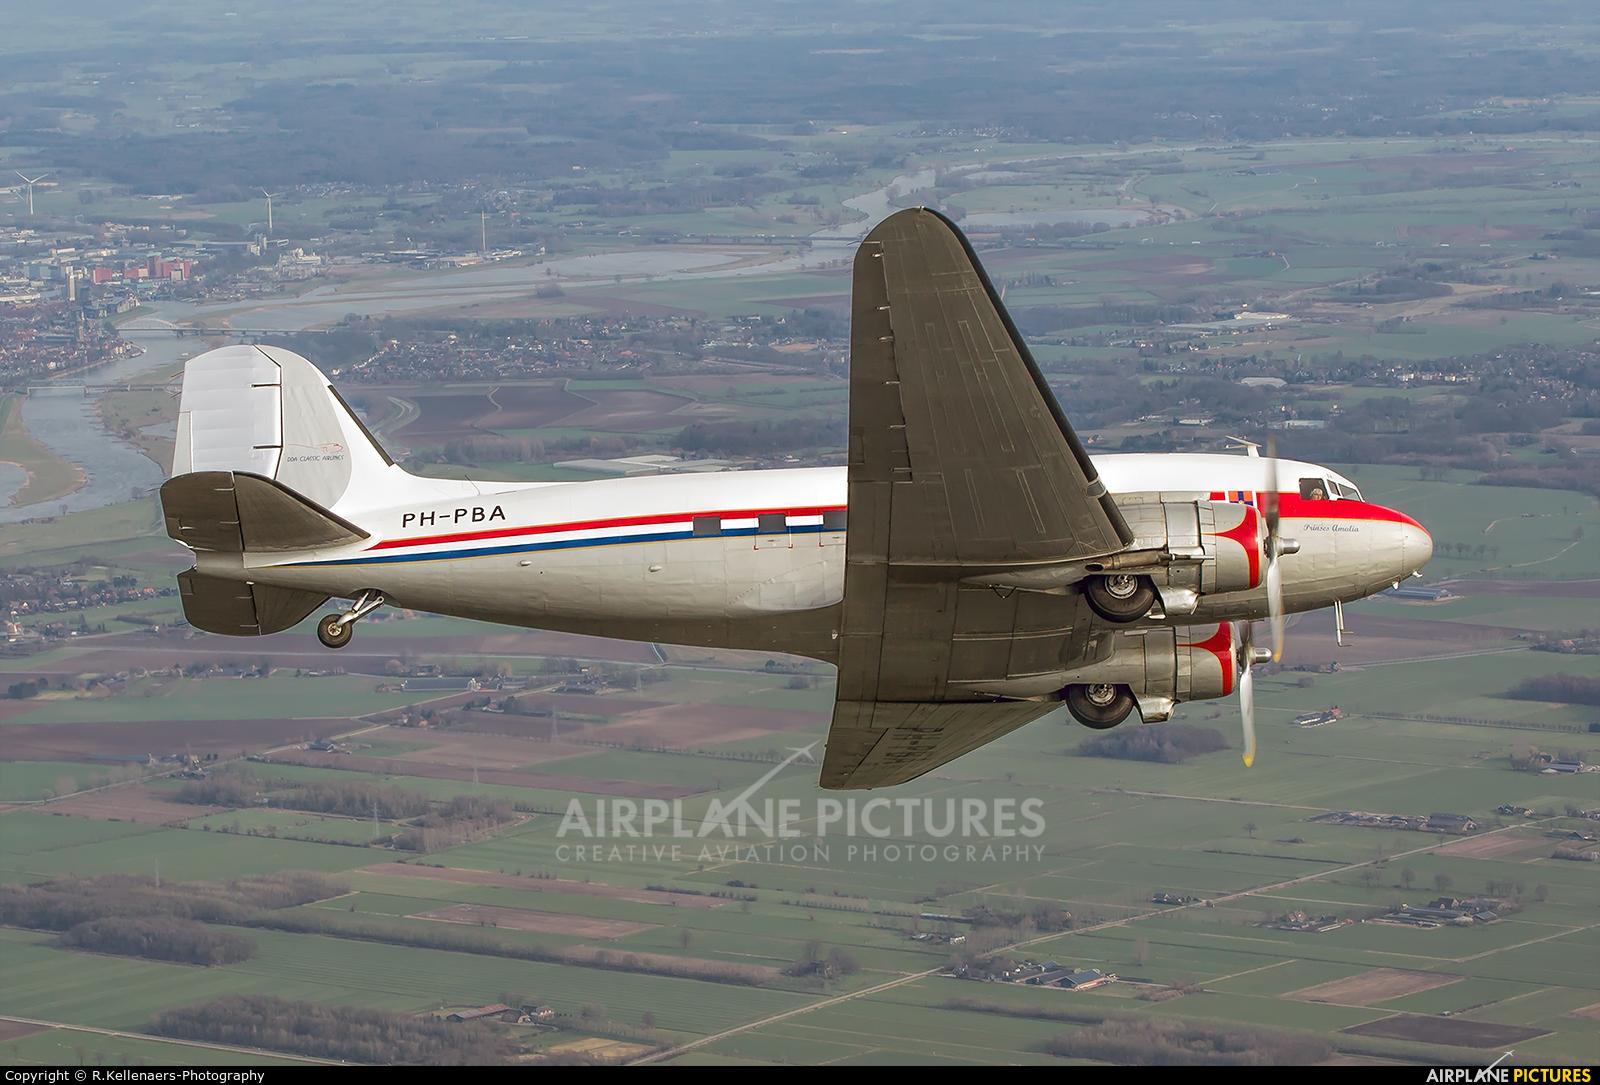 DDA Classic Airlines PH-PBA aircraft at In Flight - Netherlands